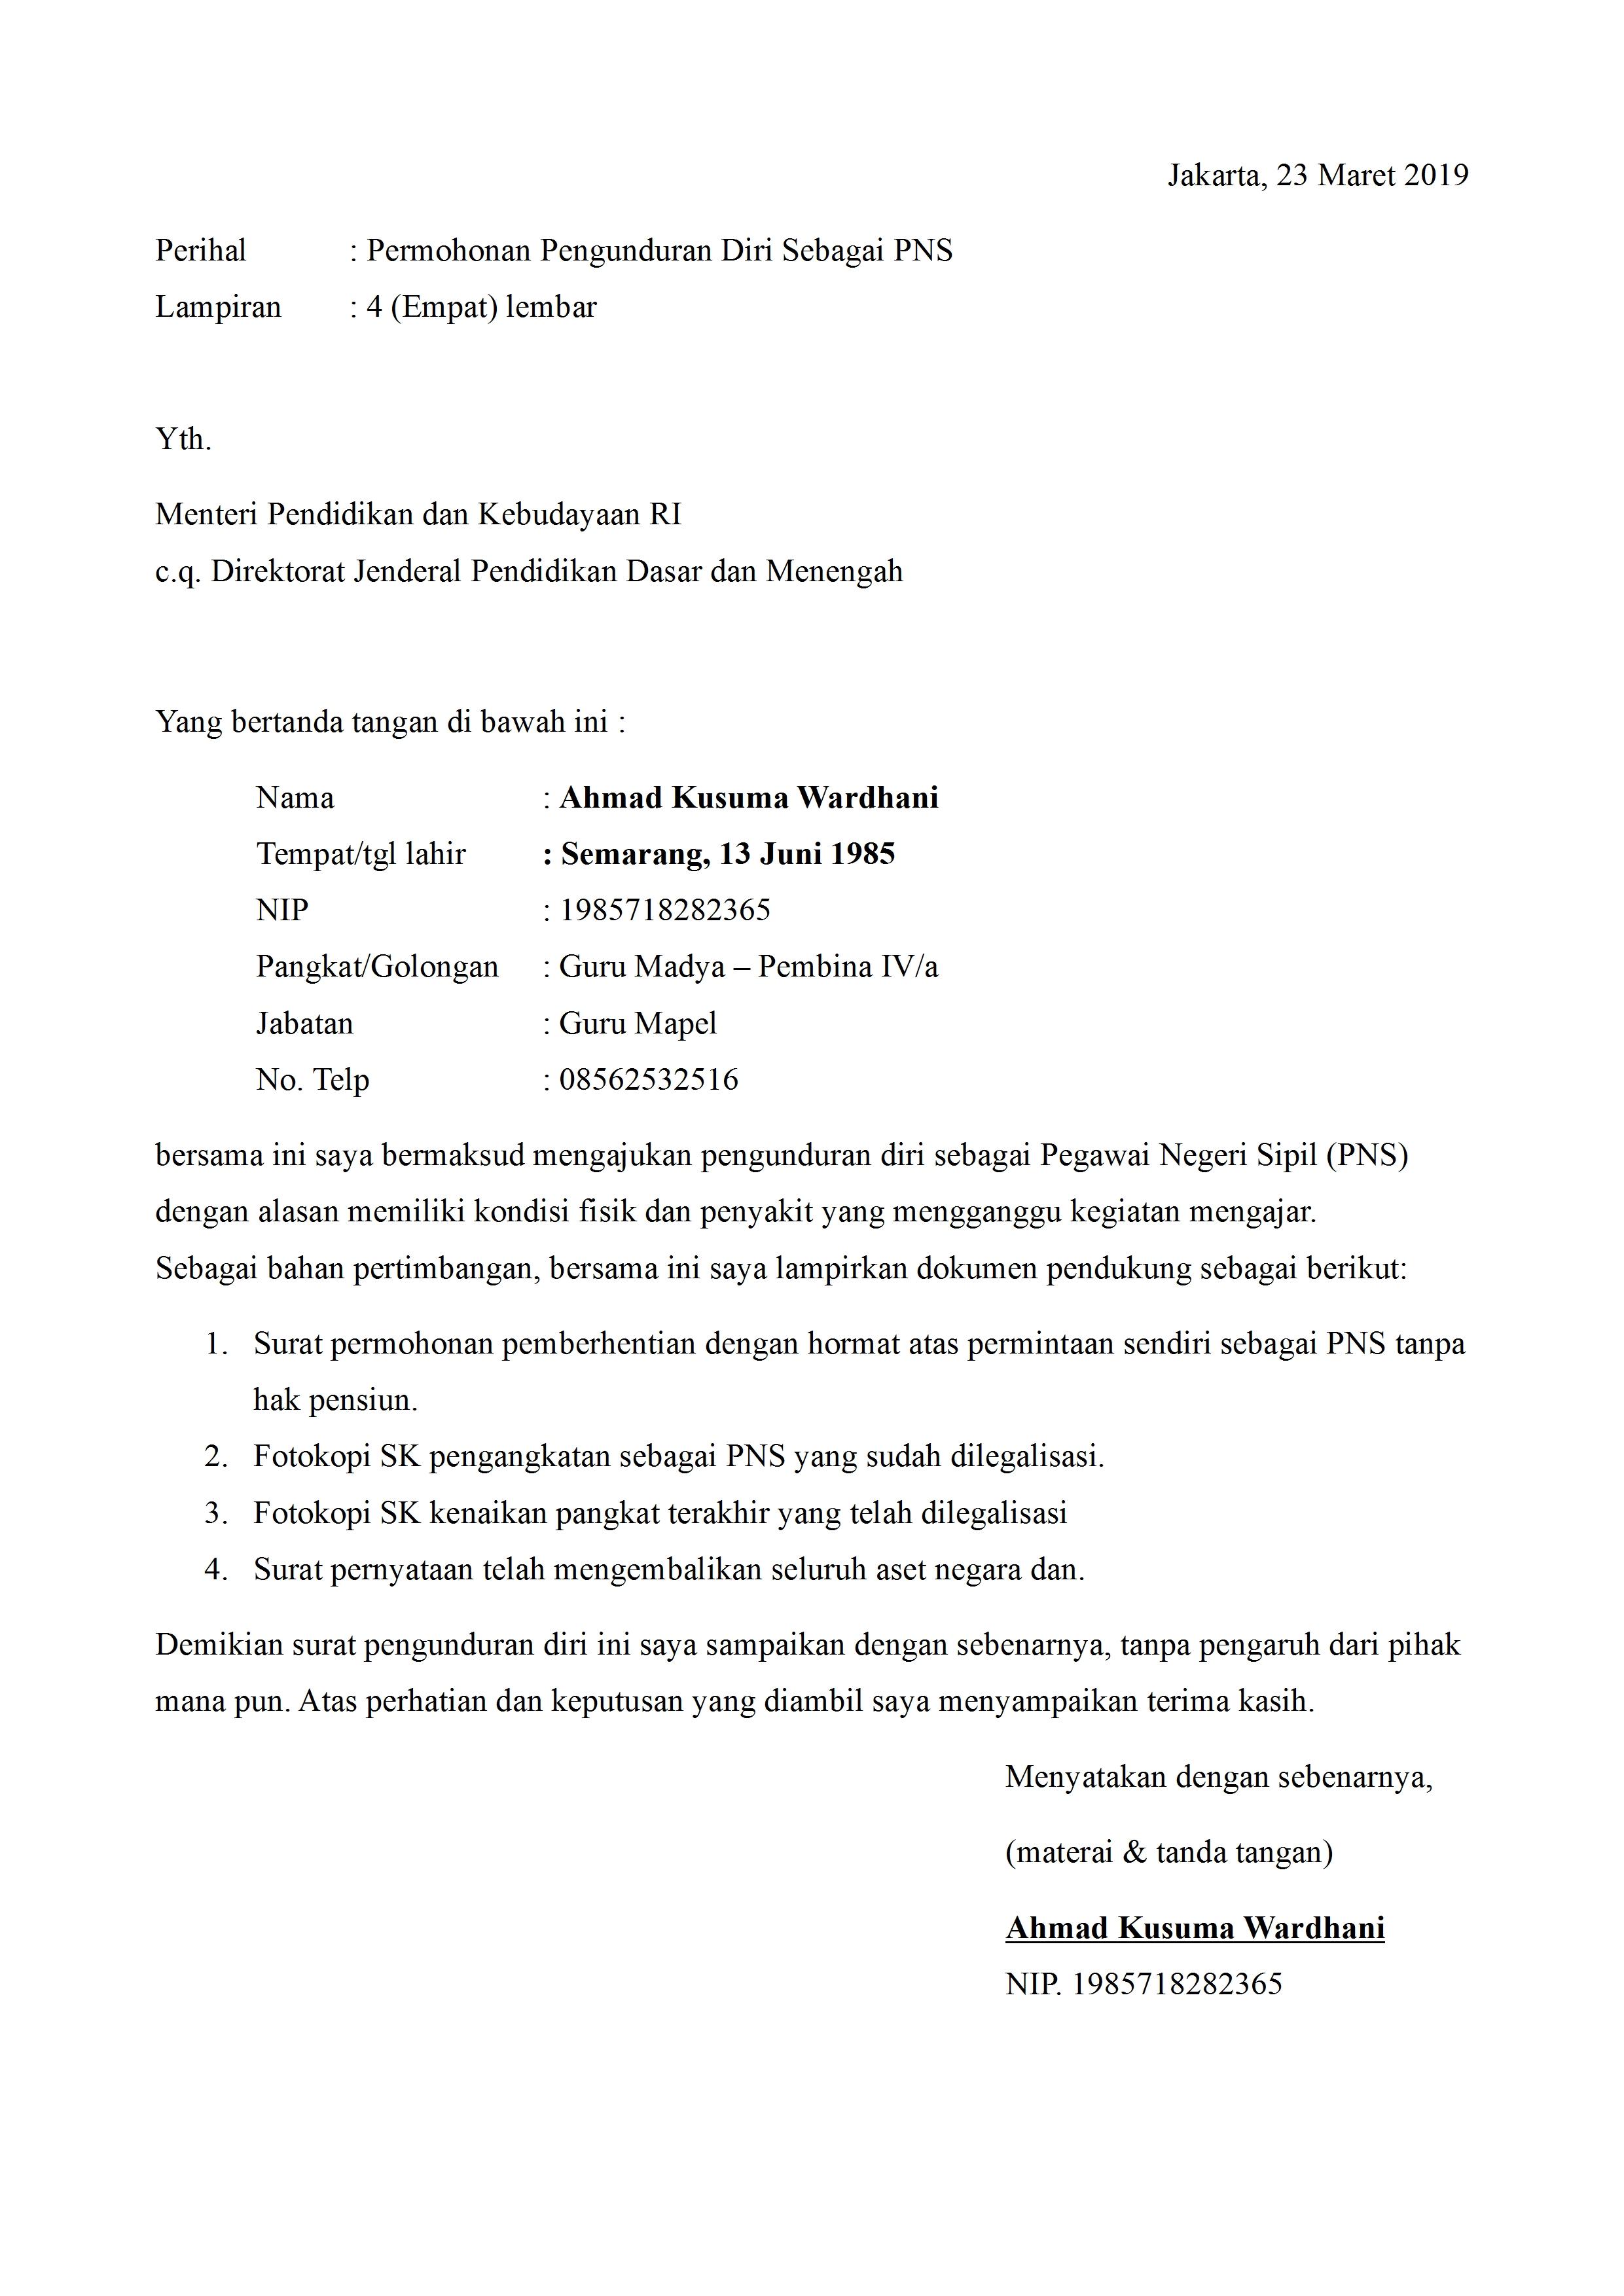 Contoh Surat Pernyataan Pengunduran Diri Dari Pns ...